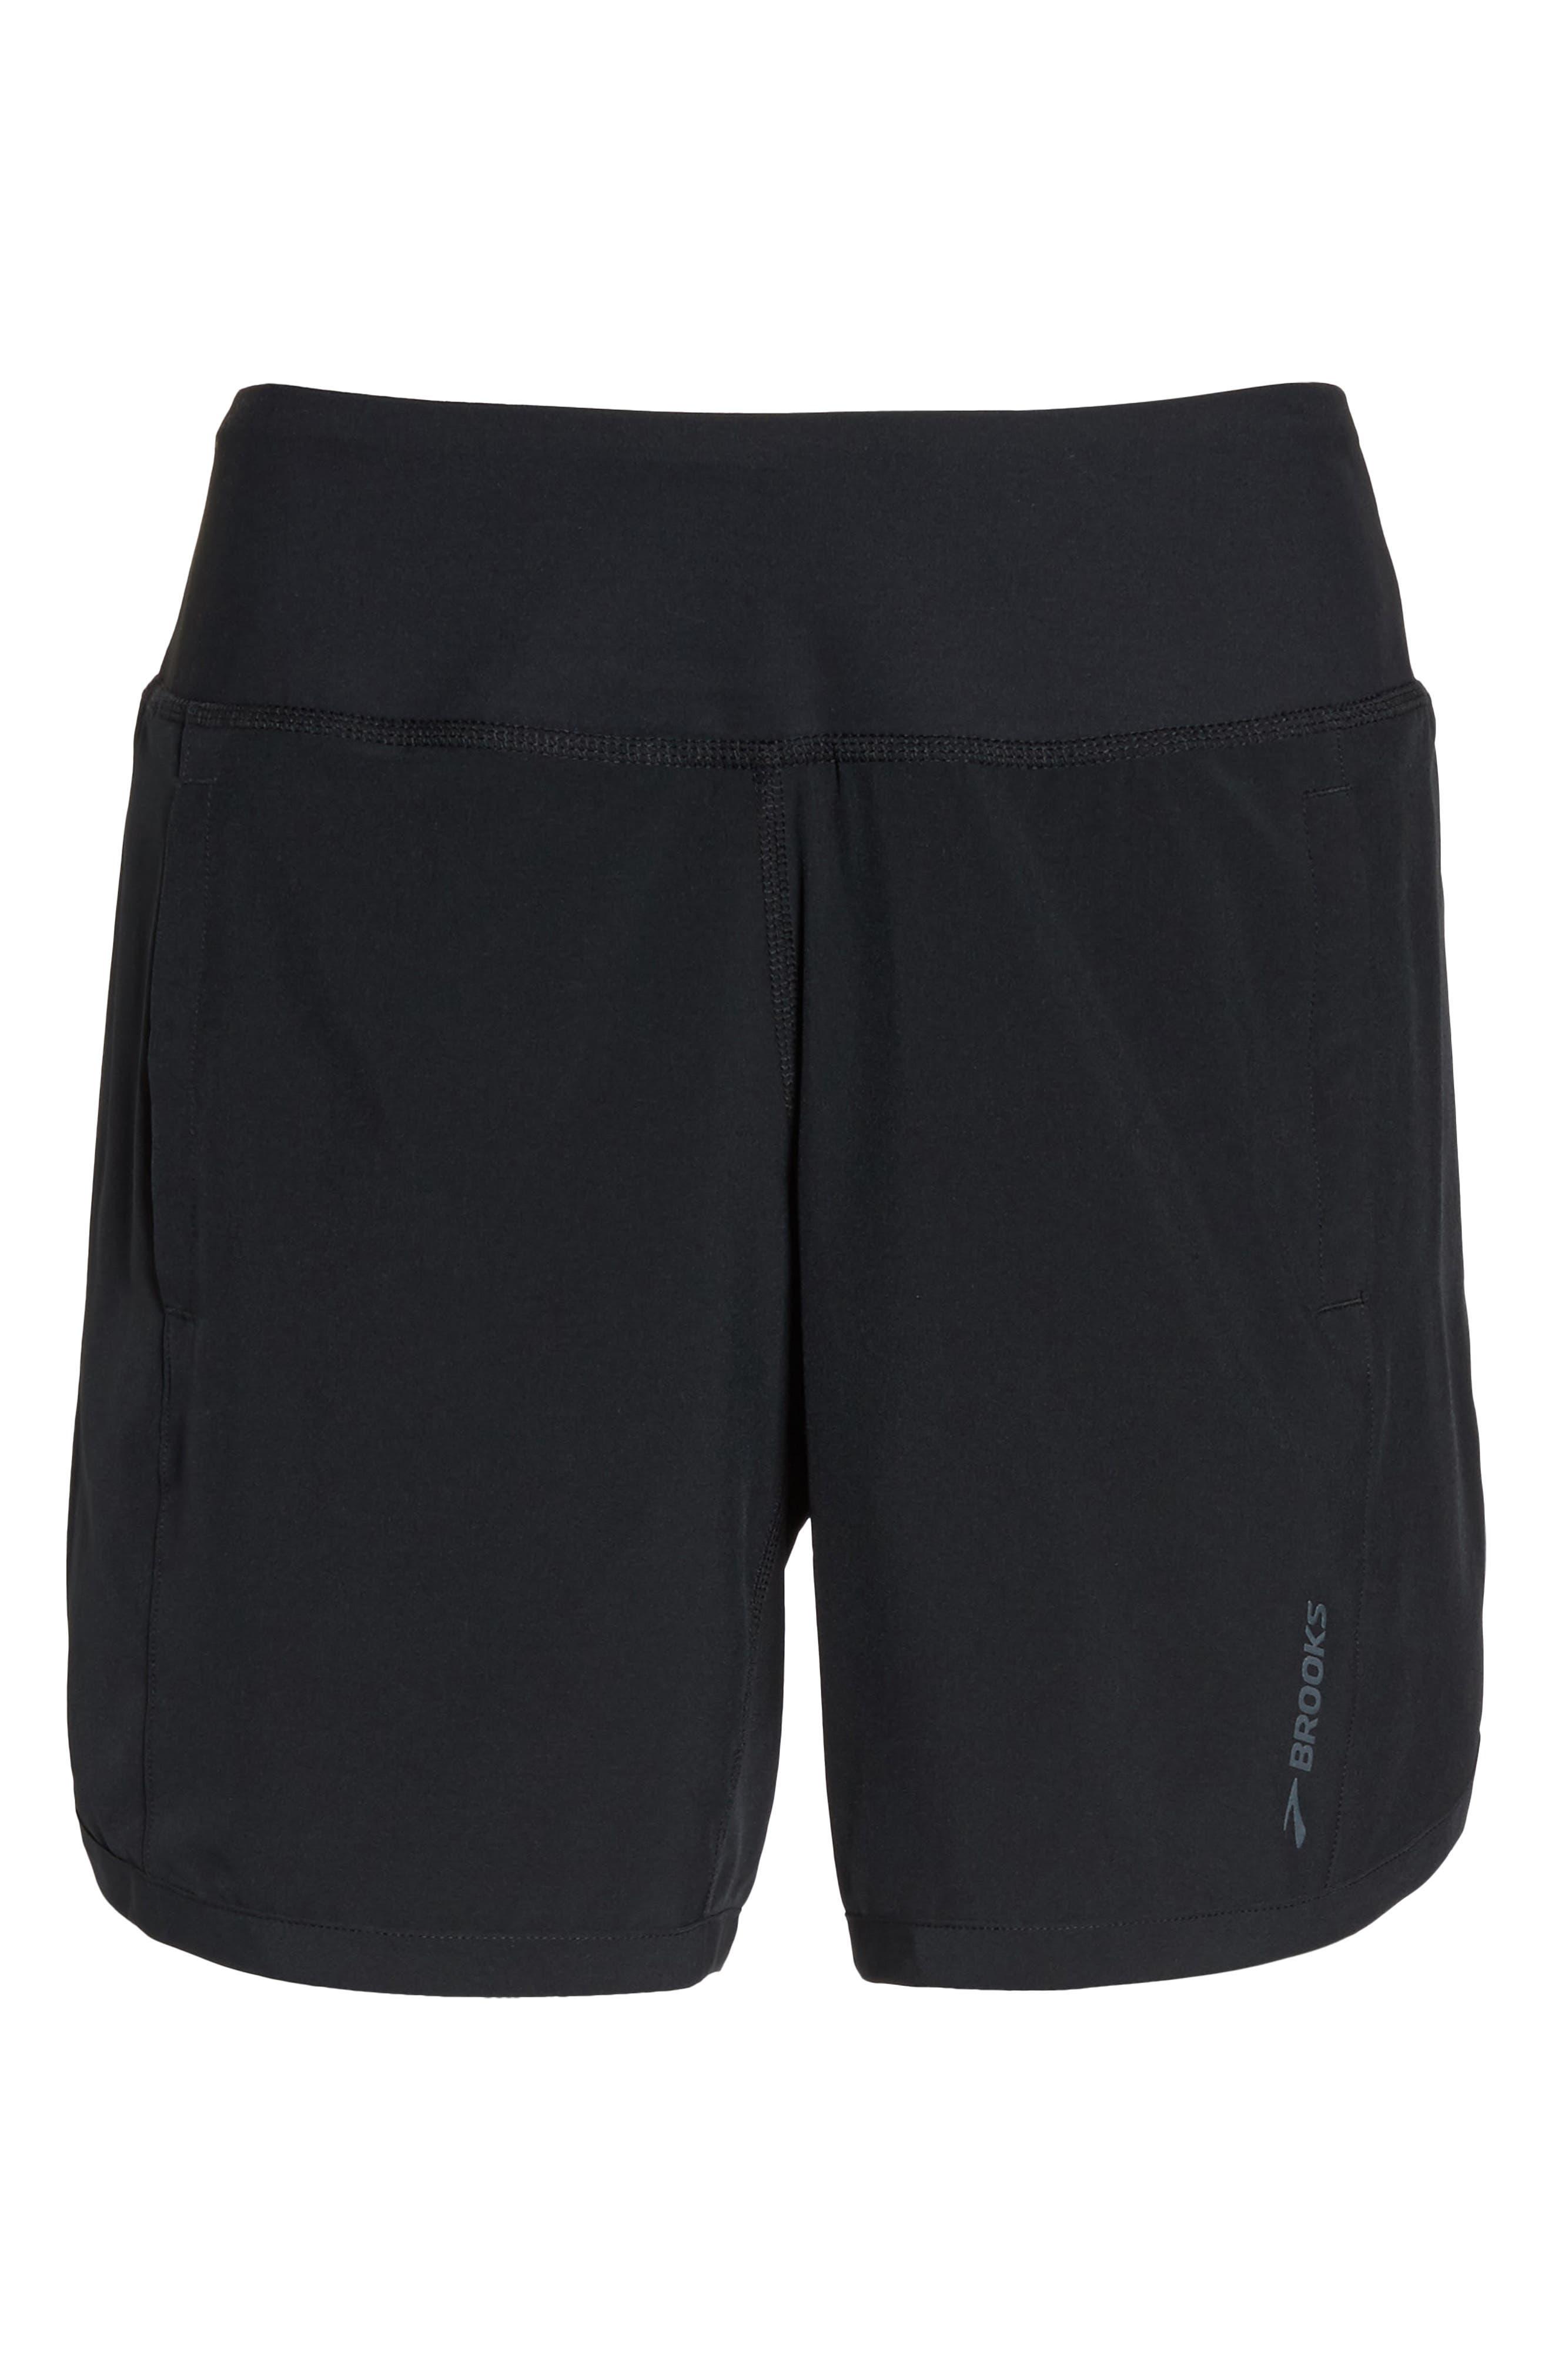 BROOKS,                             Chaser 7 Shorts,                             Alternate thumbnail 7, color,                             BLACK